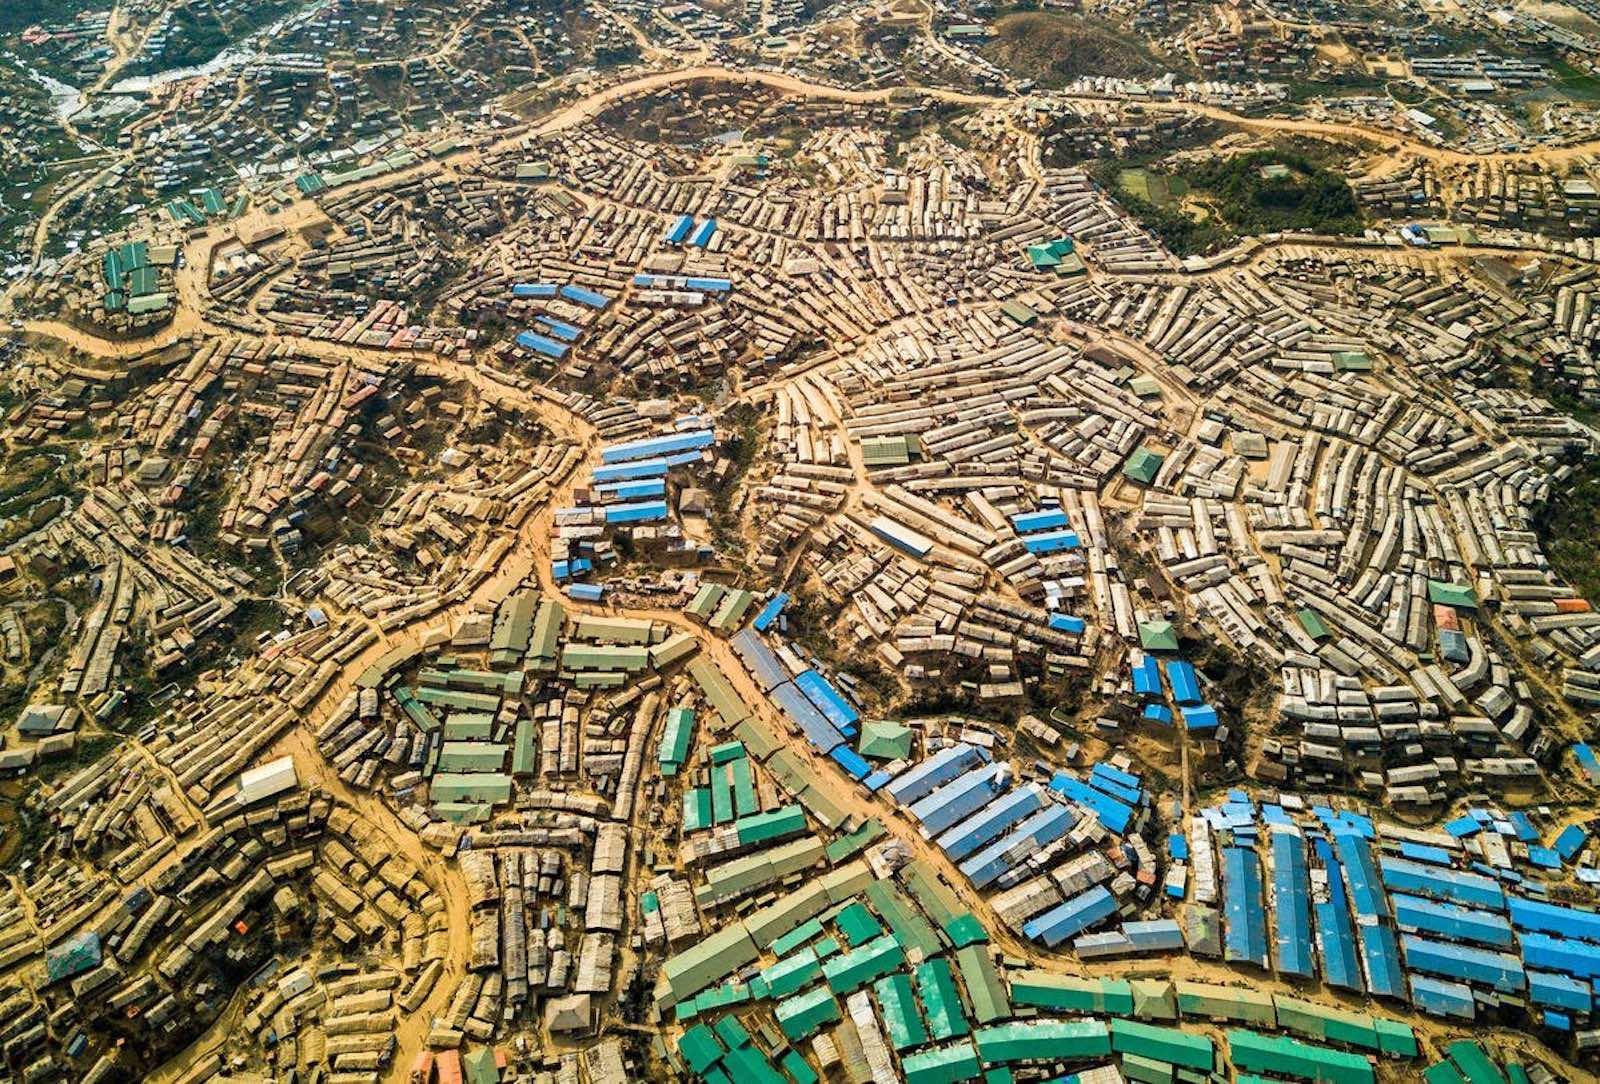 Kutupalong refugee camp in Cox's Bazar, Bangladesh (Photo: @antonioguterres / Twitter)